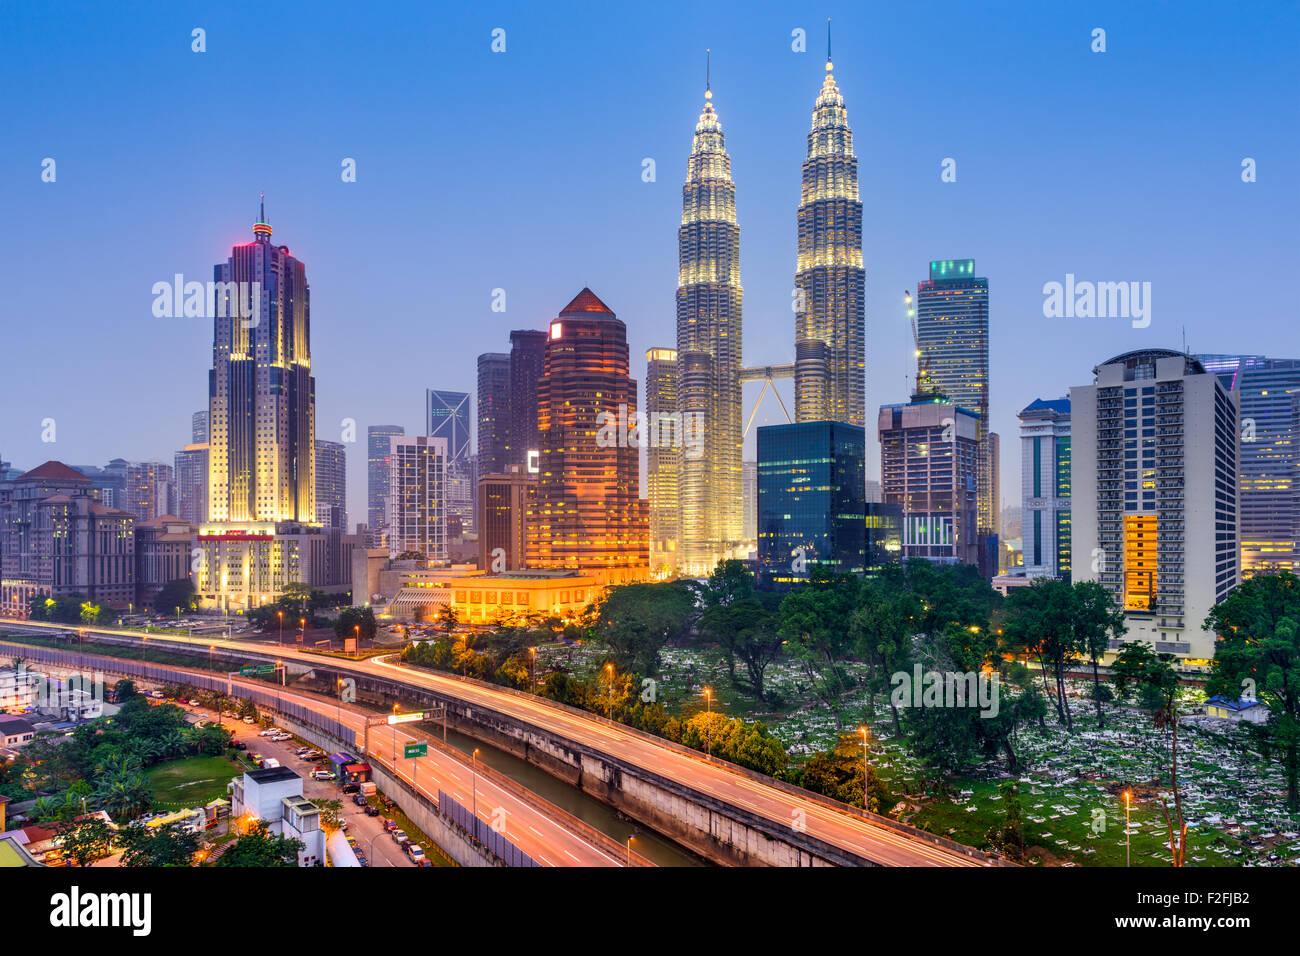 Kuala Lumpur, Malasia, el horizonte de la ciudad. Imagen De Stock